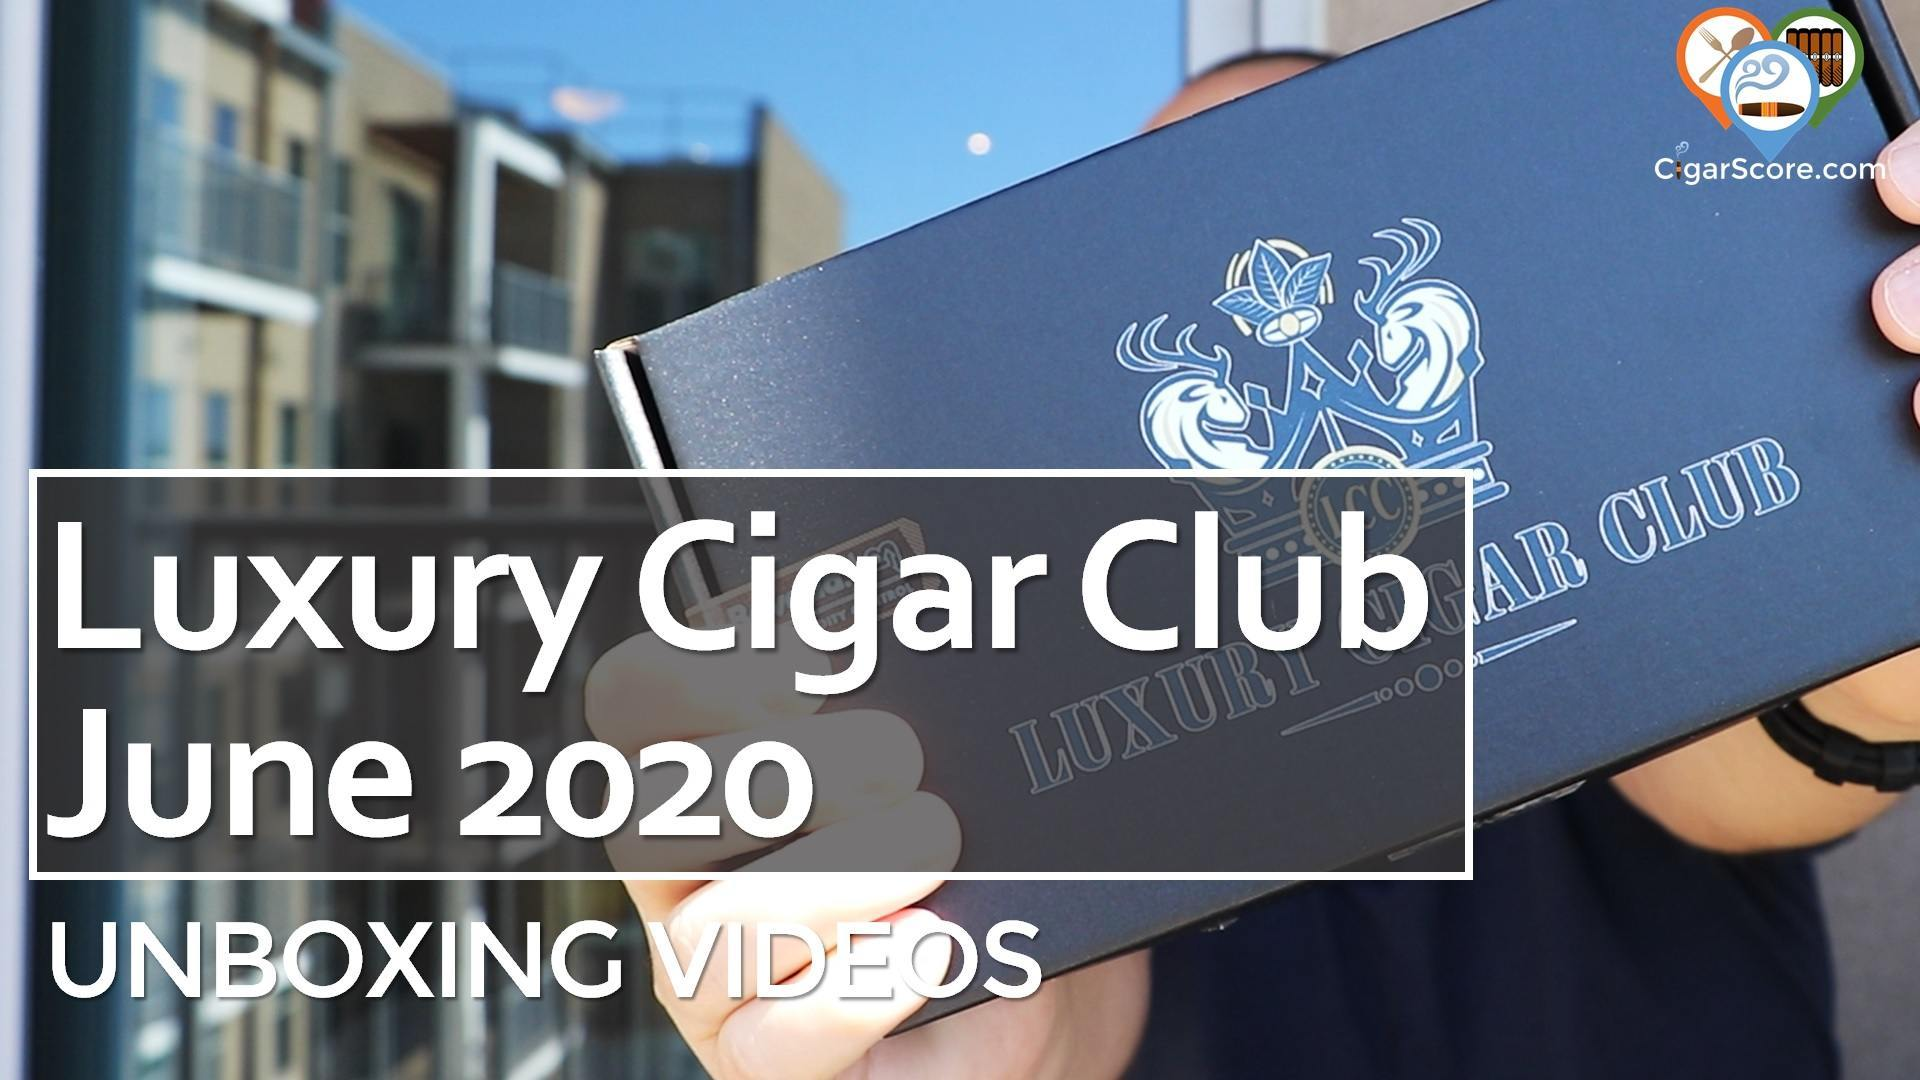 Unboxing - Luxury Cigar Club 2020 June